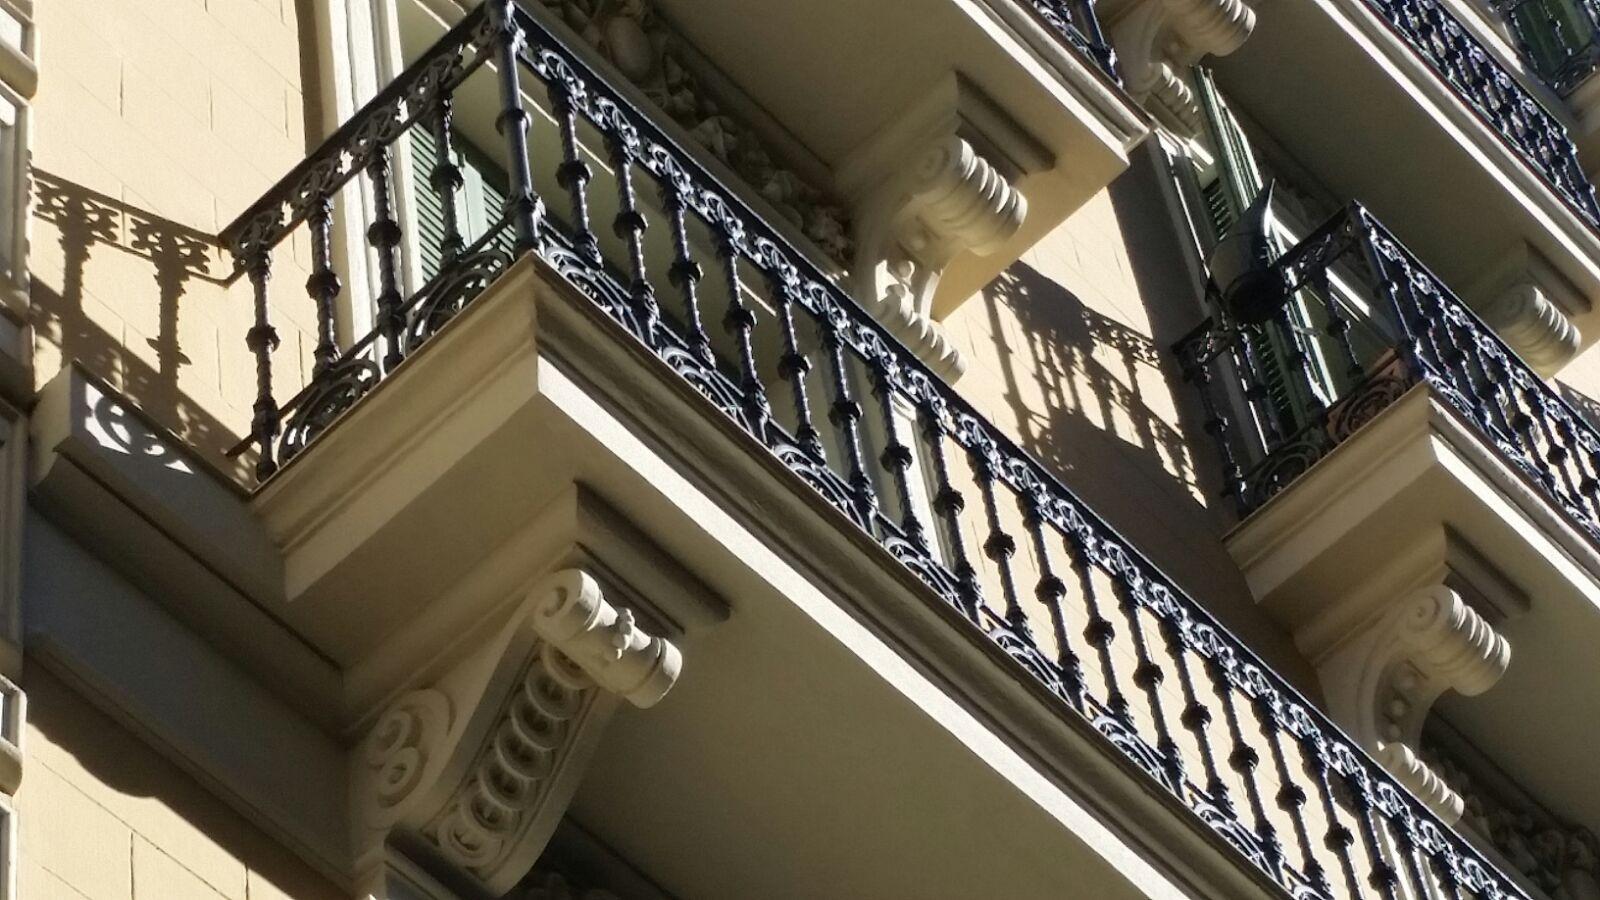 Rehabilitación fachada Rbla. Catalunya 120 de Barcelona - Arquitecto Barcelona - Despacho de Arquitectura Barcelona